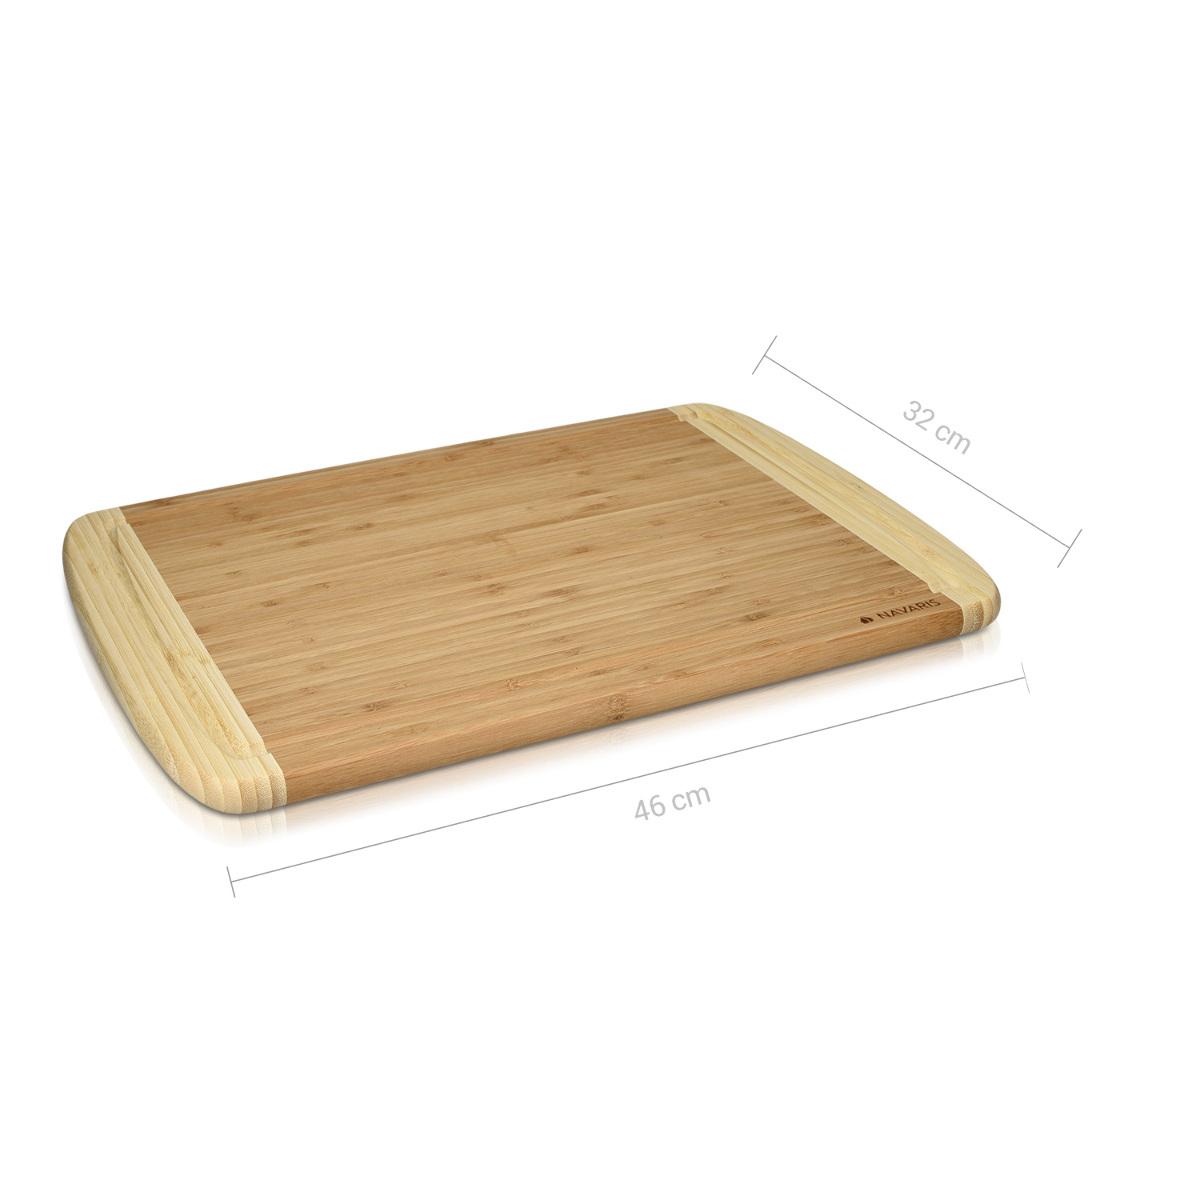 Küchenbrett Holz Groß ~ navaris bambus schneidbrett zweifarbiges küchenbrett holz 46 x 32 x 1,8 cm ebay